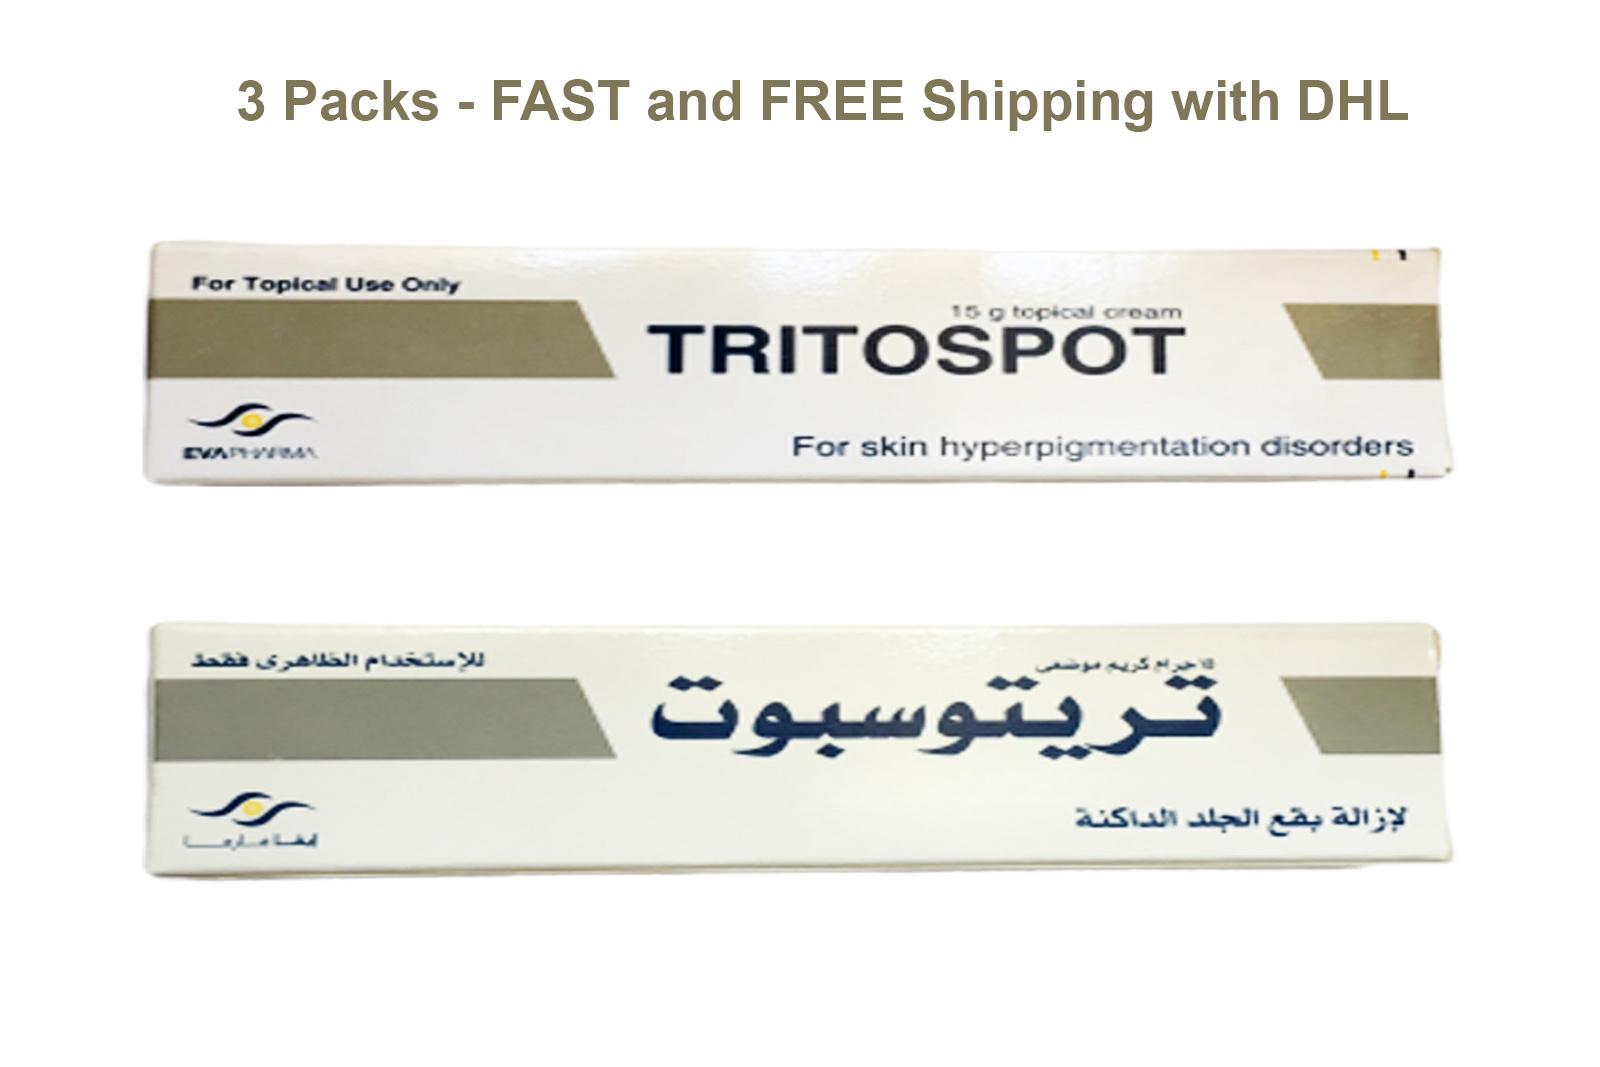 3 packs tritospot cream whitening cream for skin hyperpigmentation problems 1